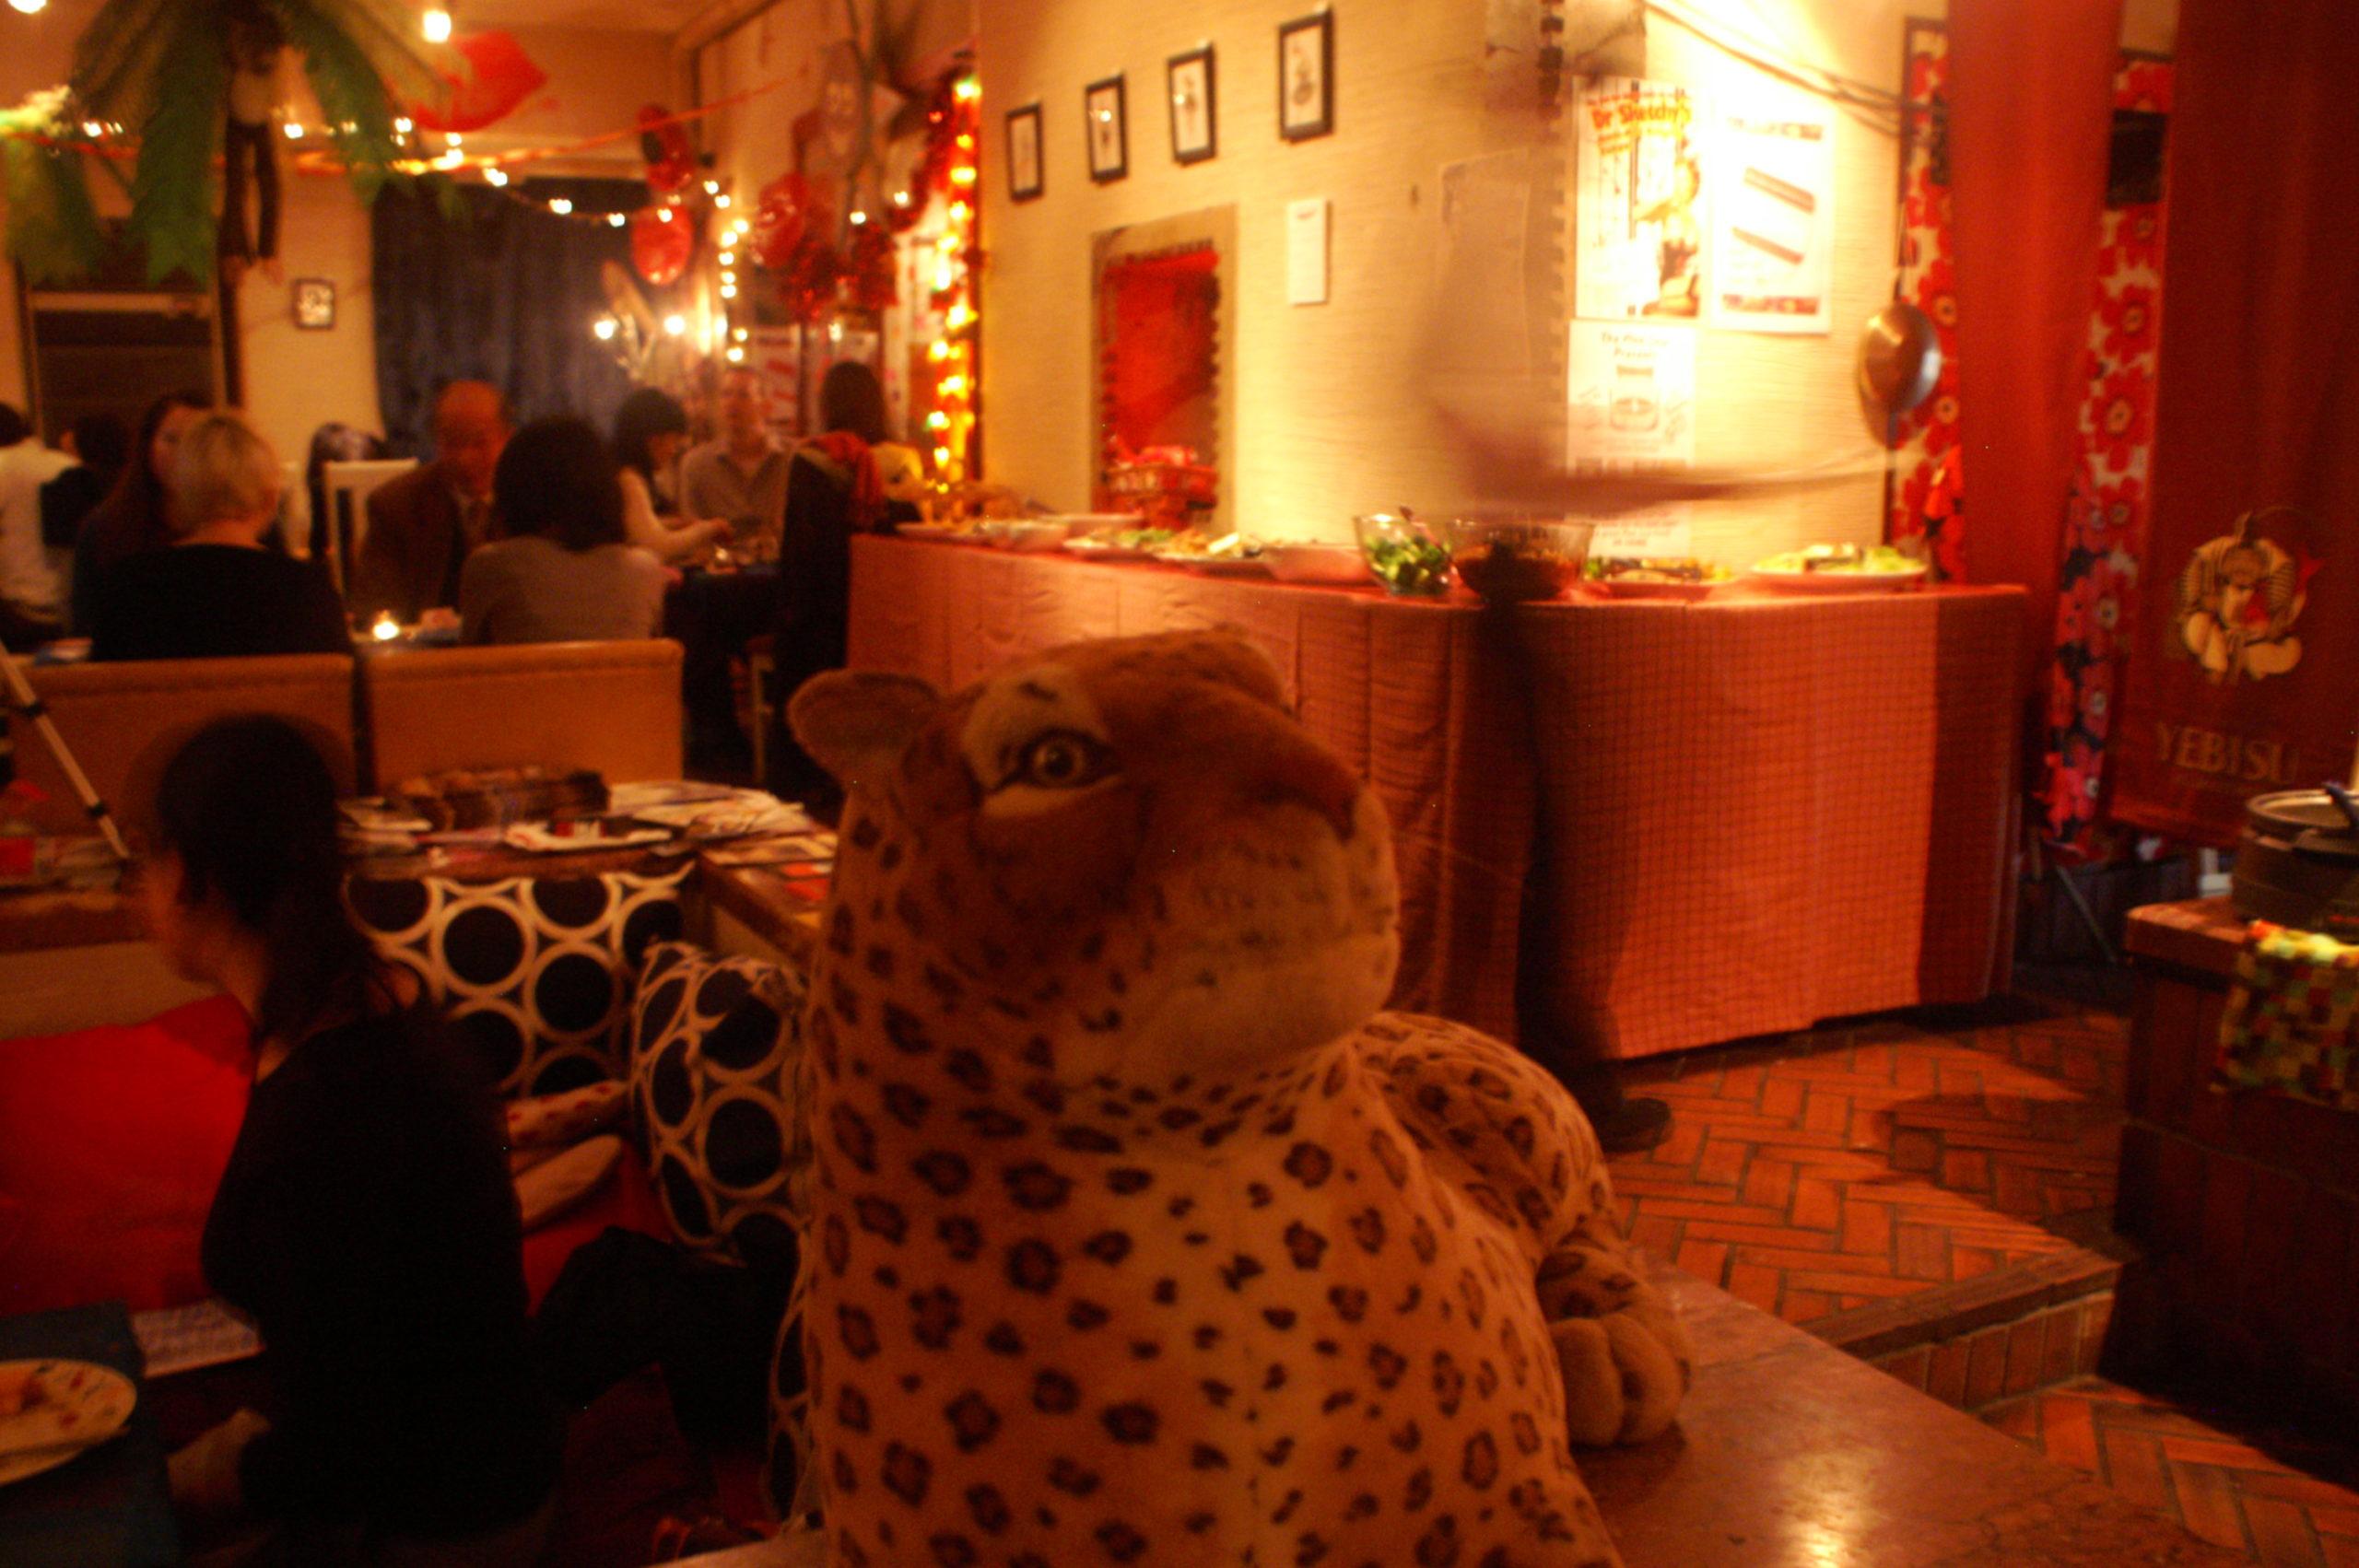 Plush leopard at the Vegan meet-up Tokyo